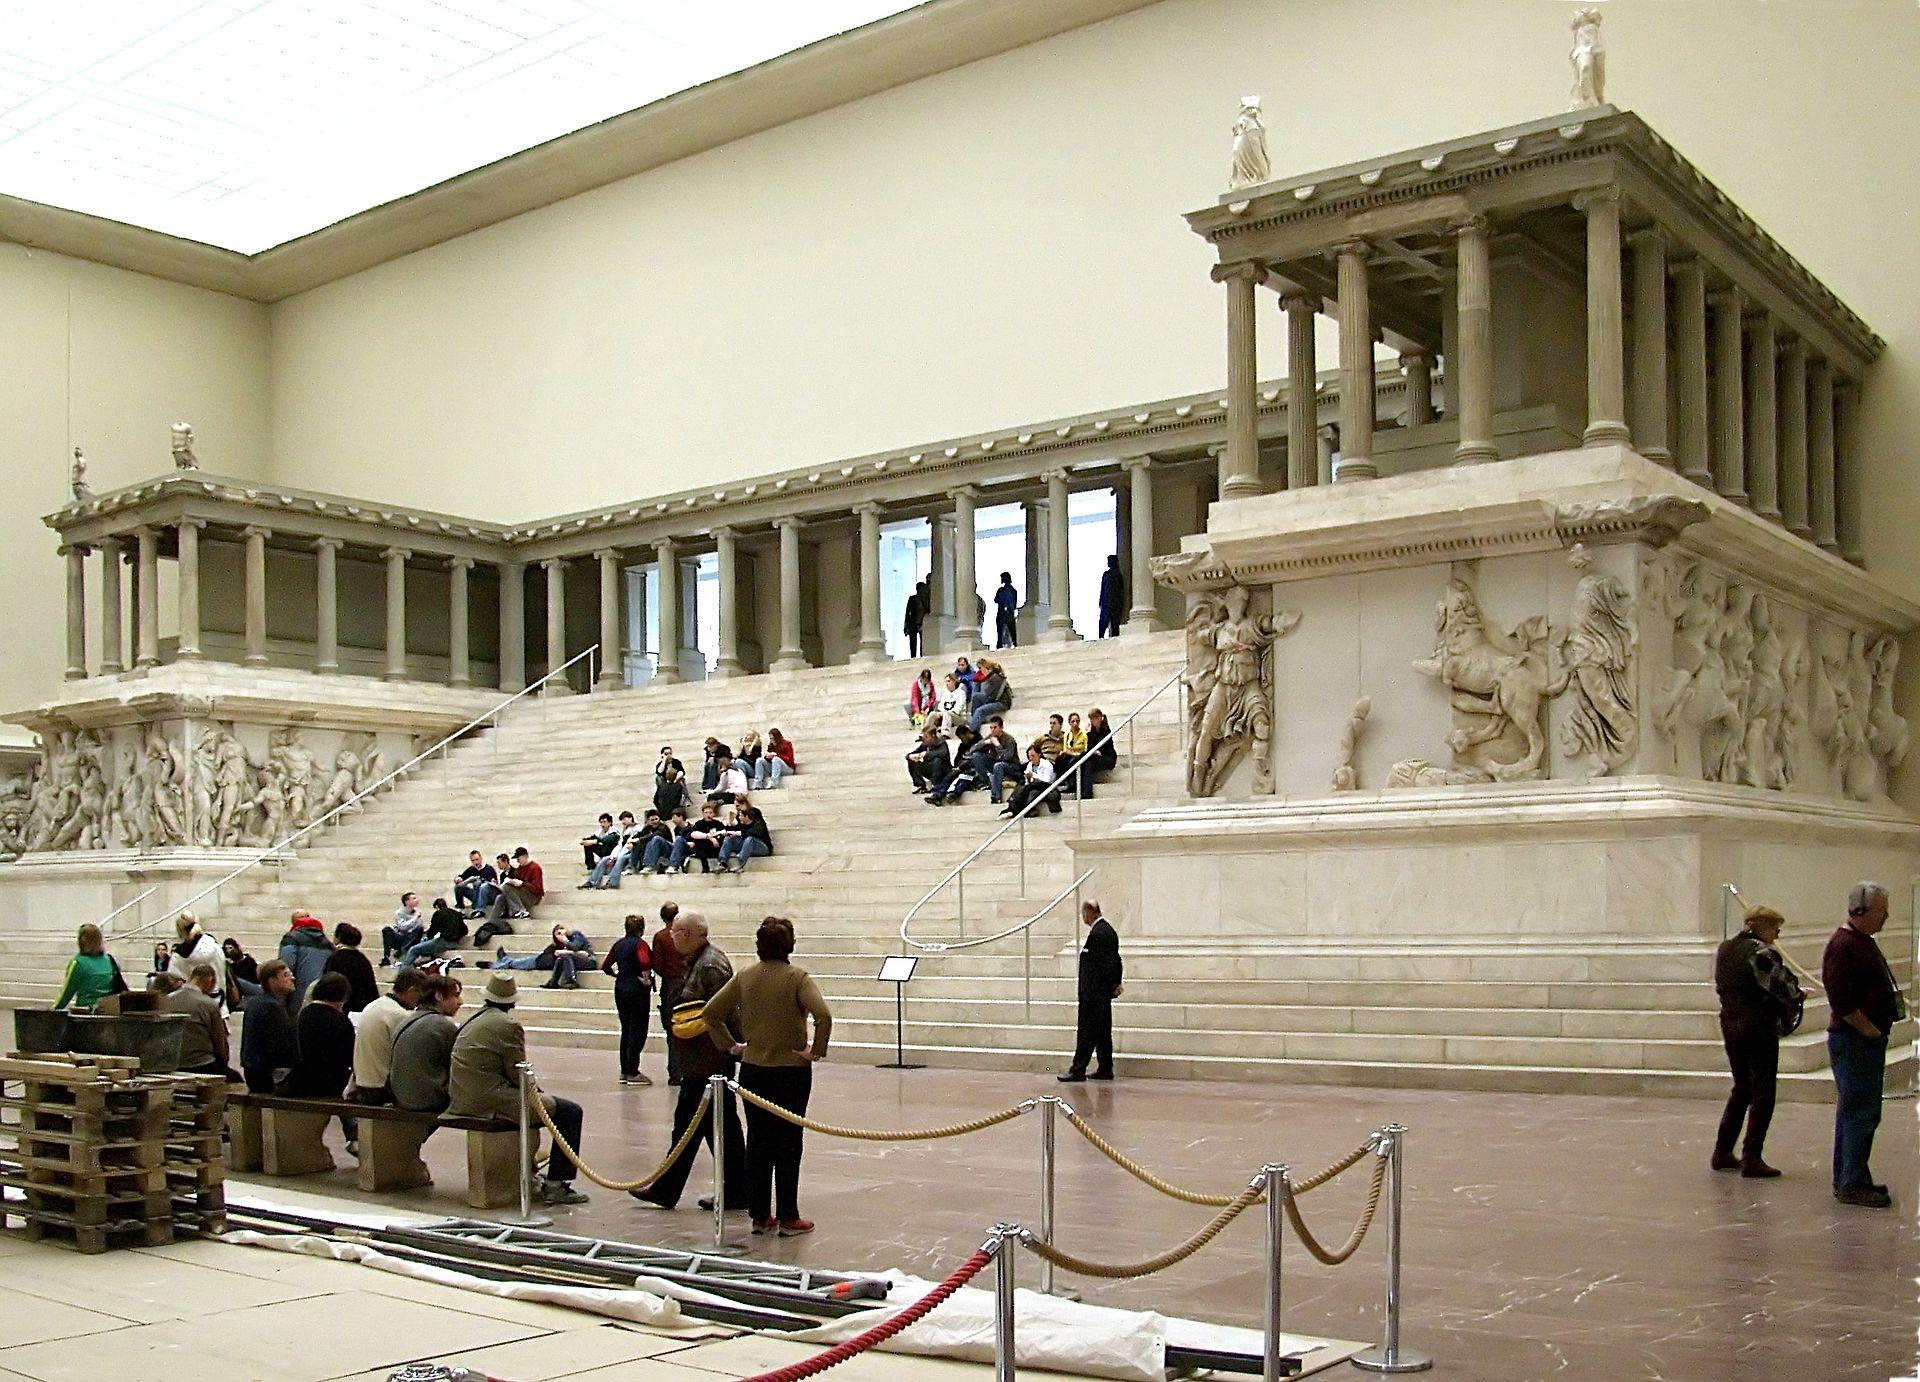 Pergamon Altar Wikipedia